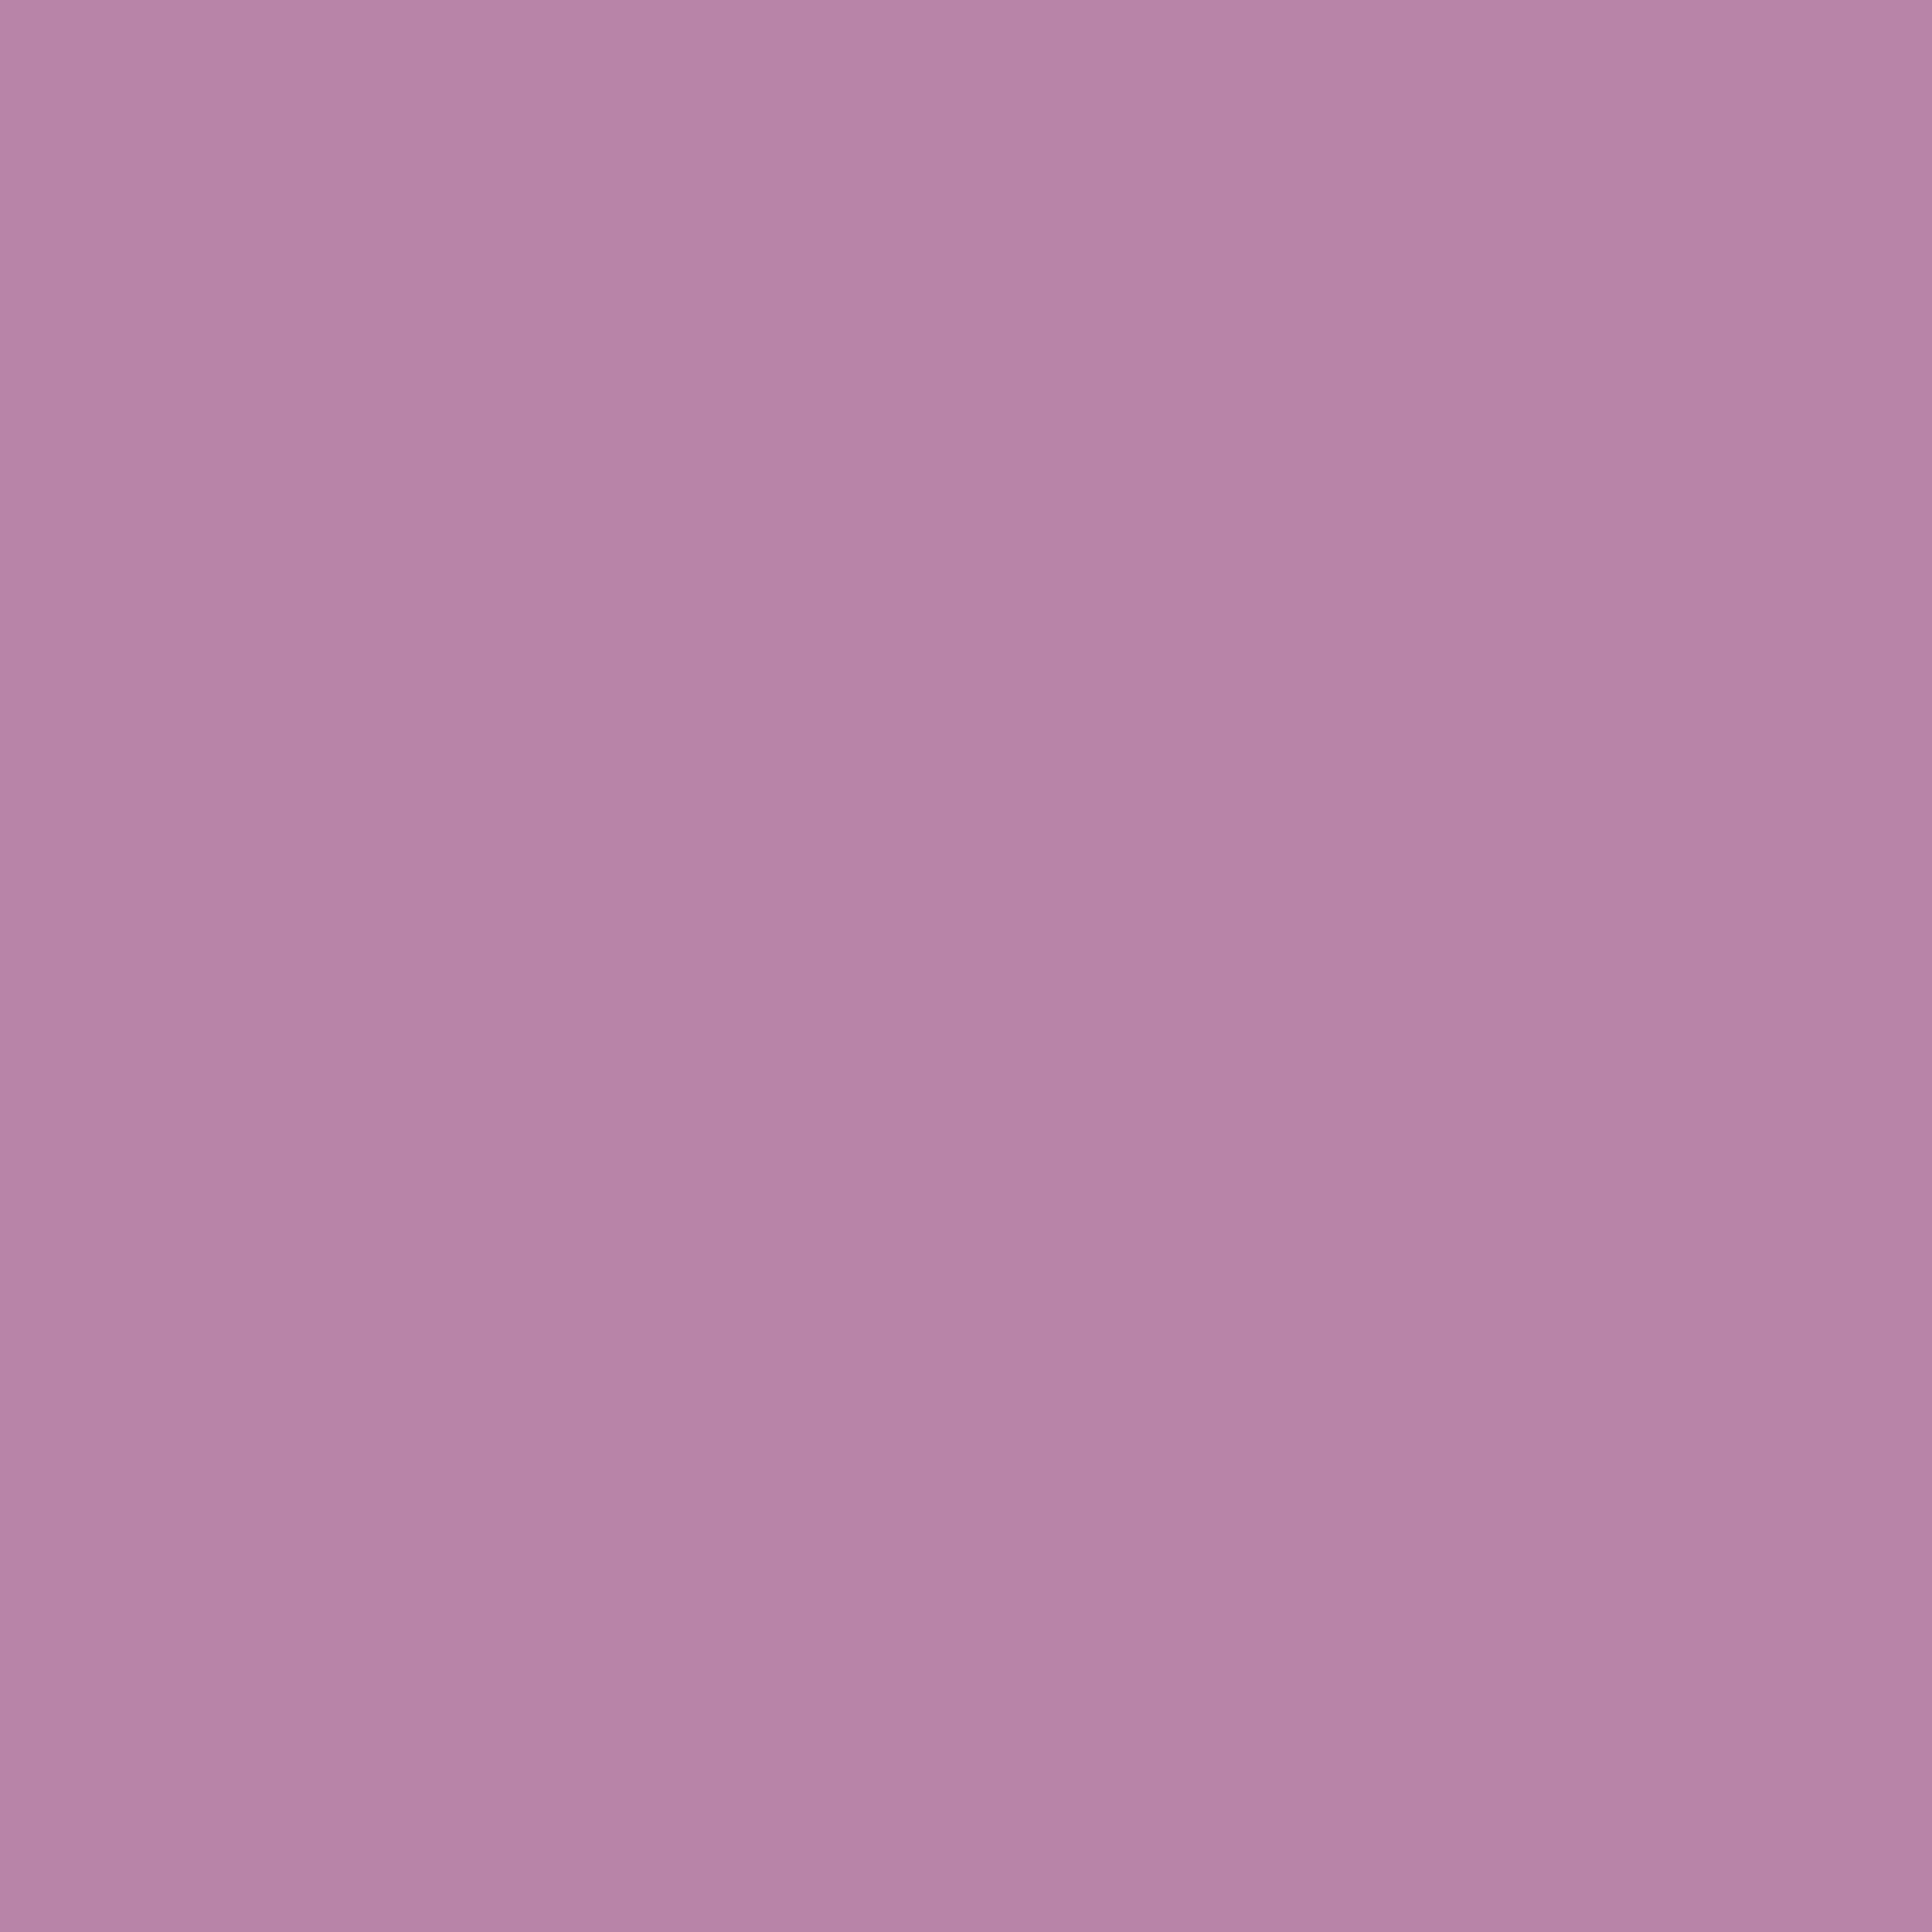 2732x2732 Opera Mauve Solid Color Background